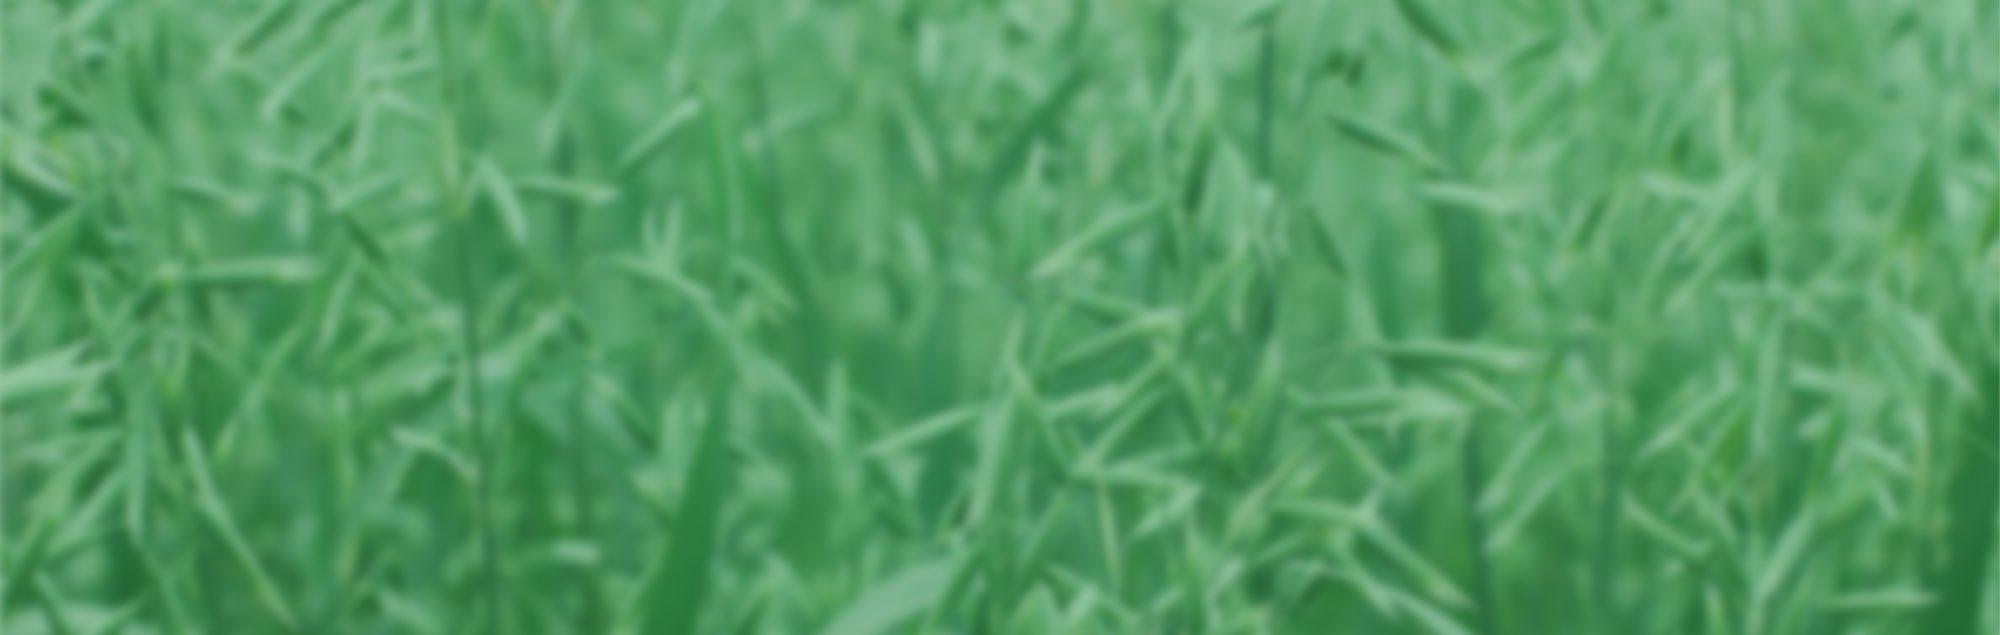 A close up field of oat plants